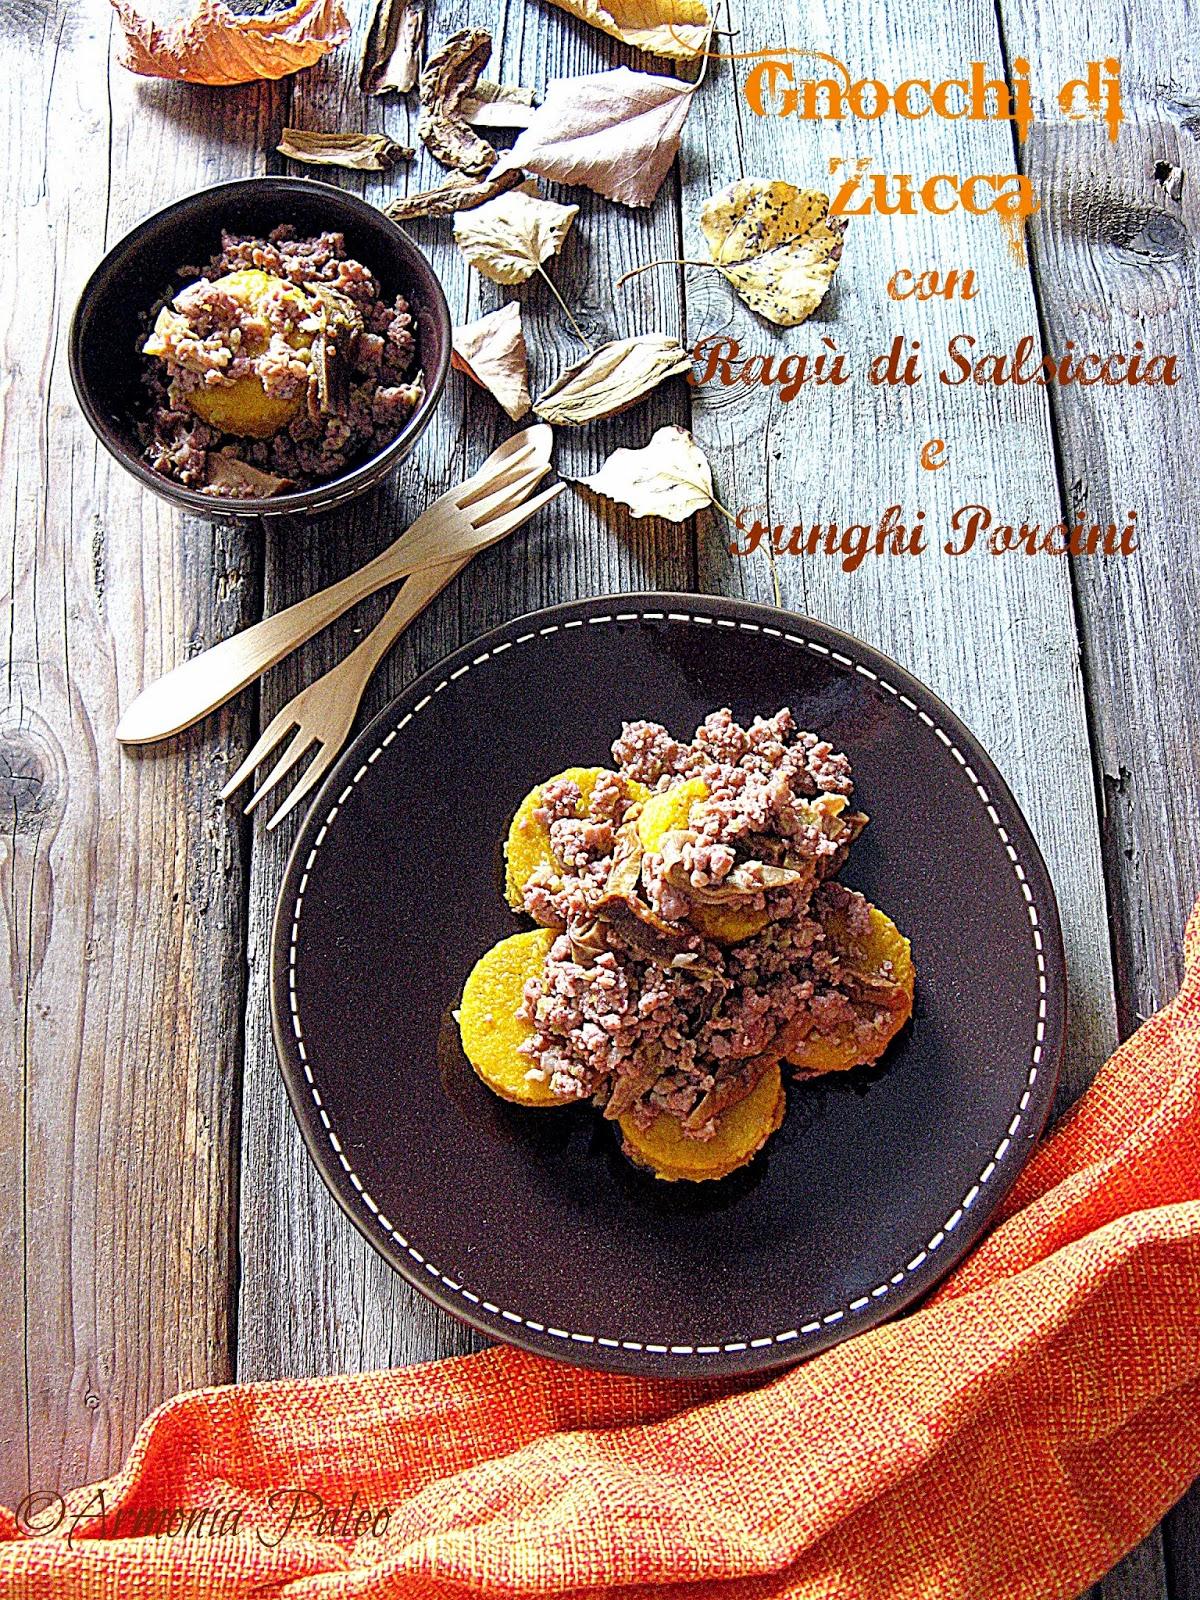 gnocchi di zucca con ragù di salsiccia e funghi porcini